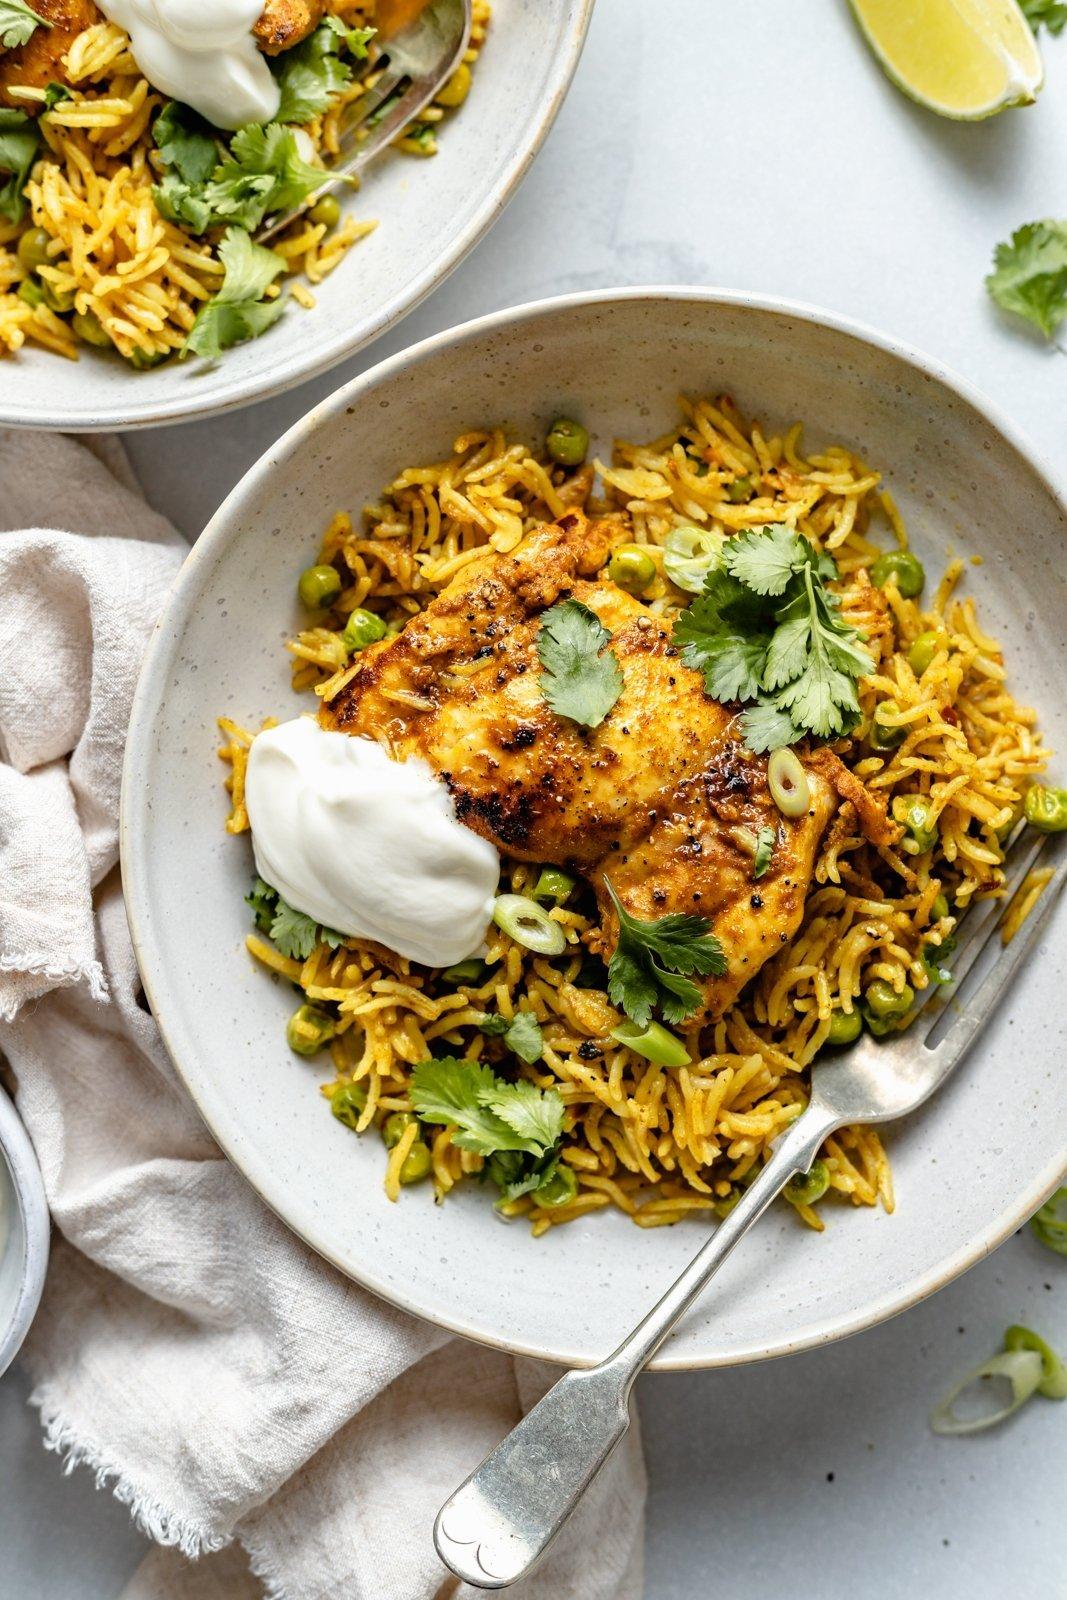 tandoori chicken on a plate with rice and yogurt